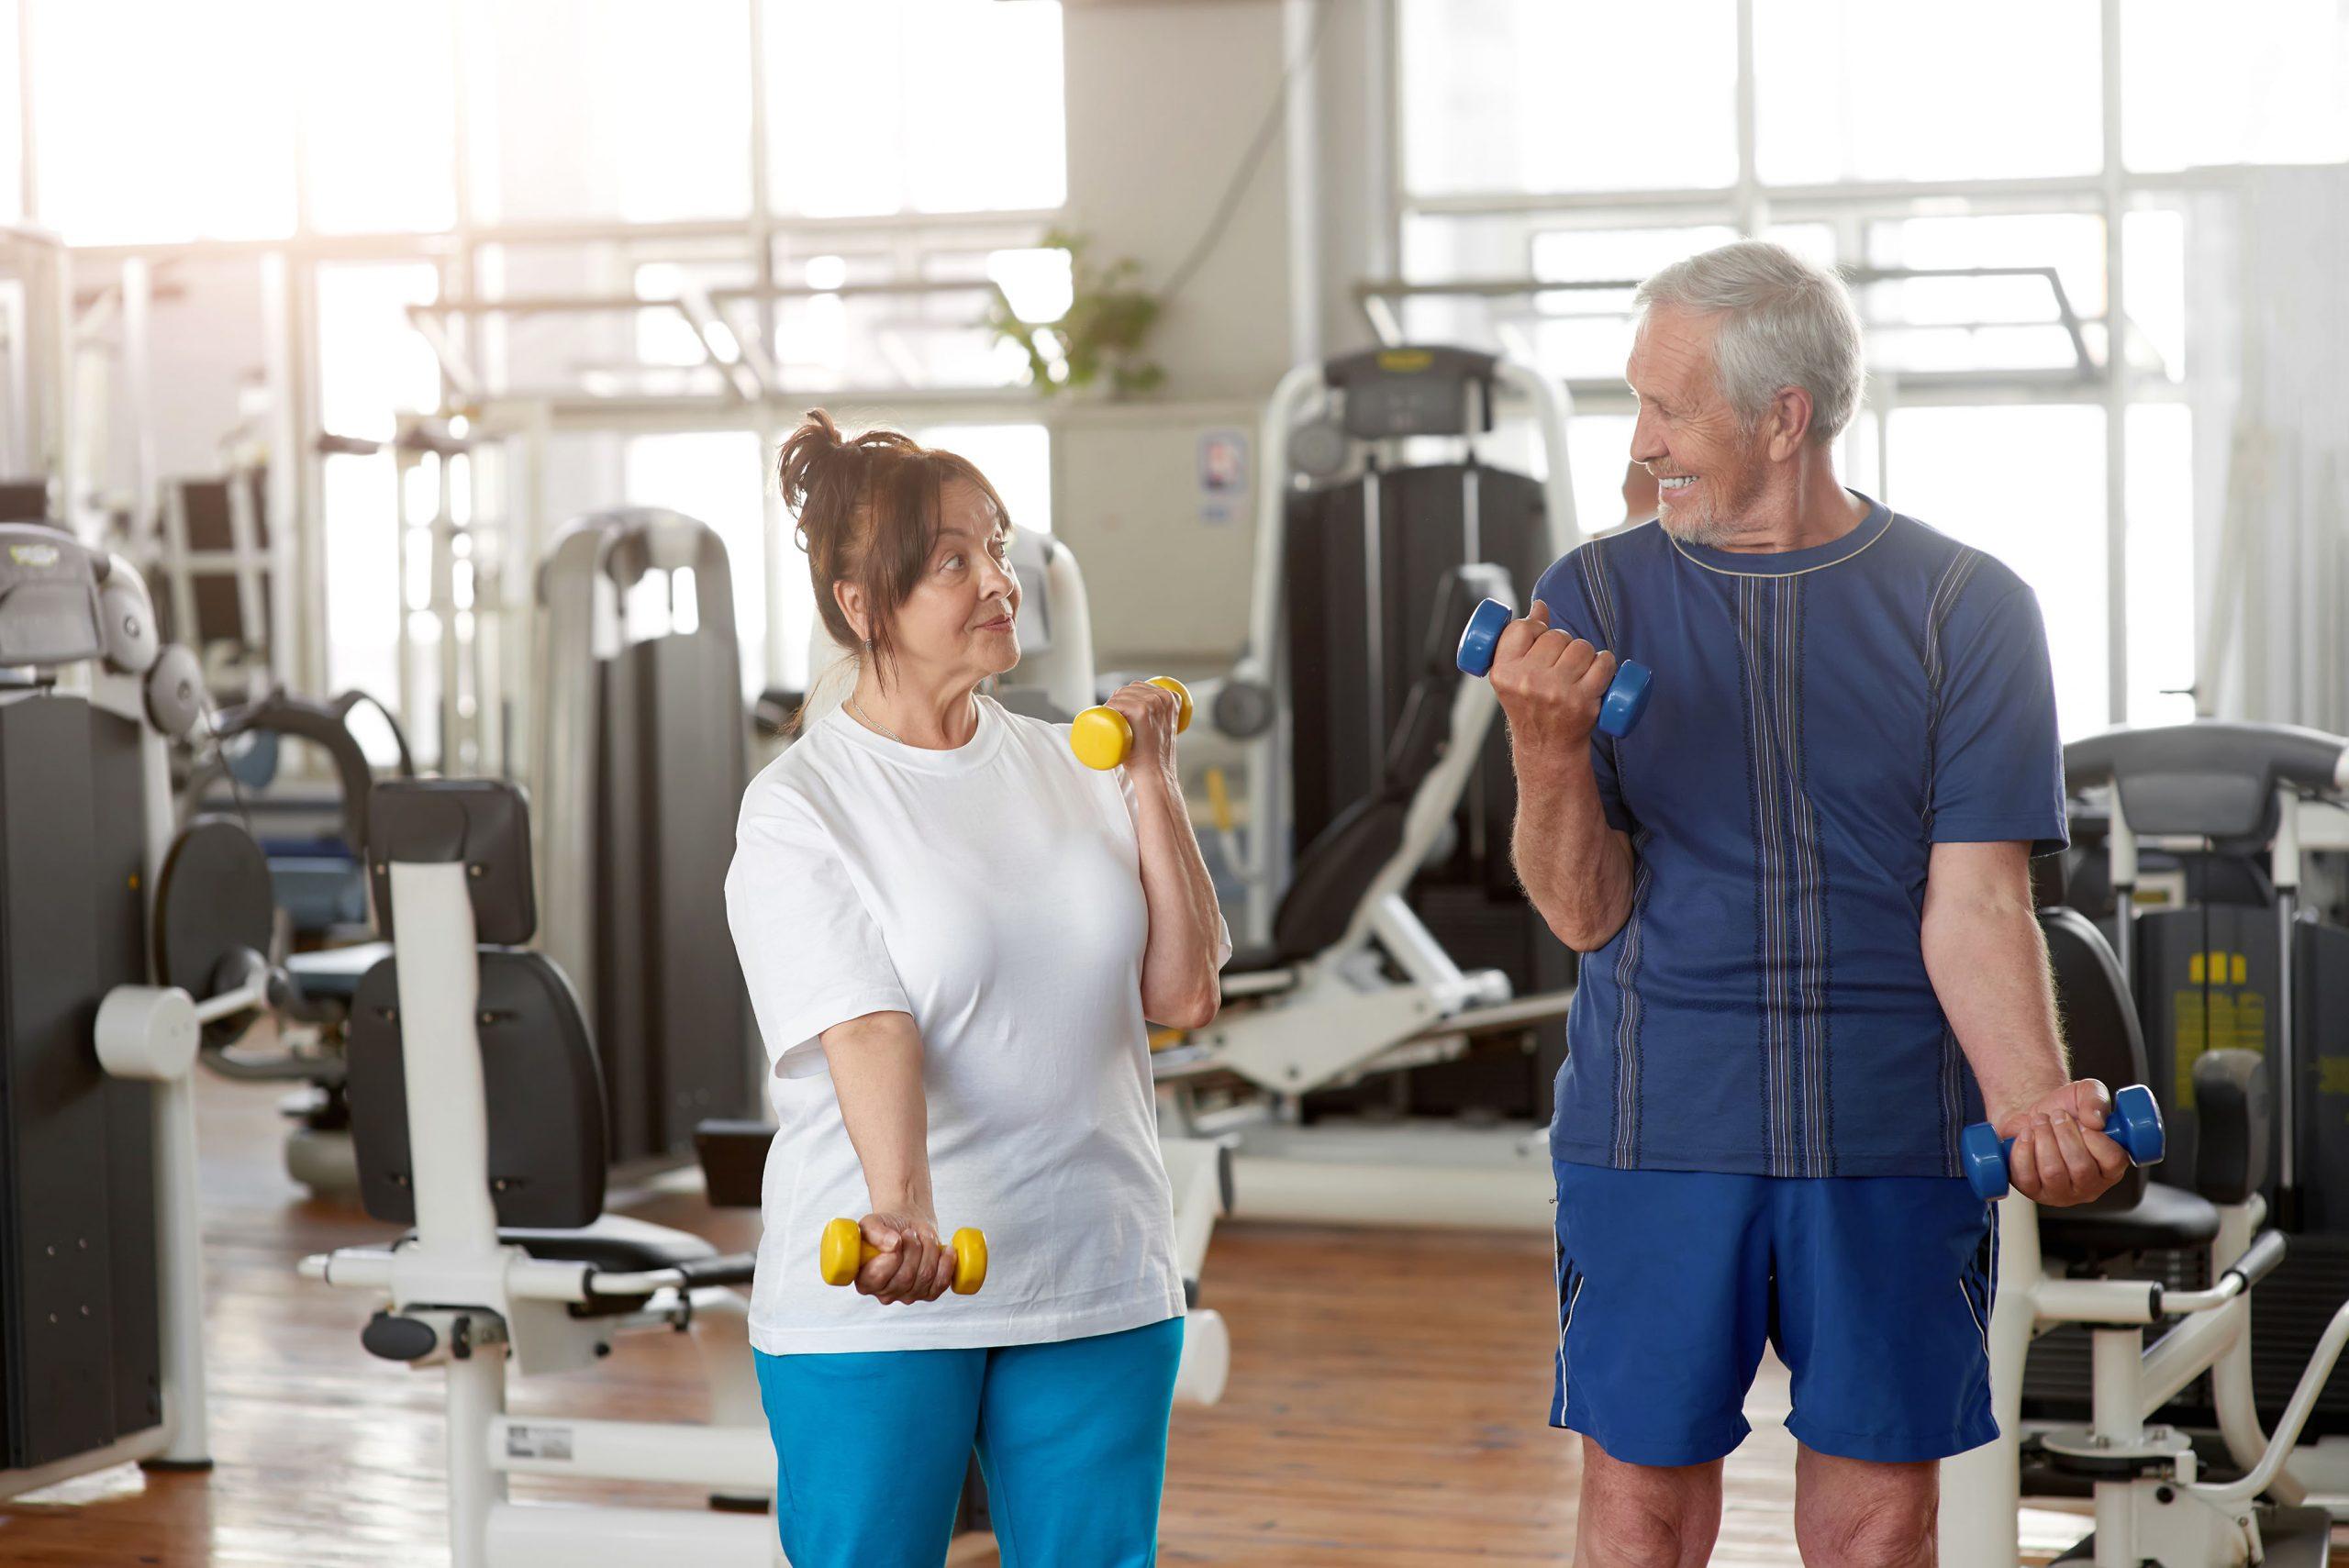 Encouraging wellness in older adults